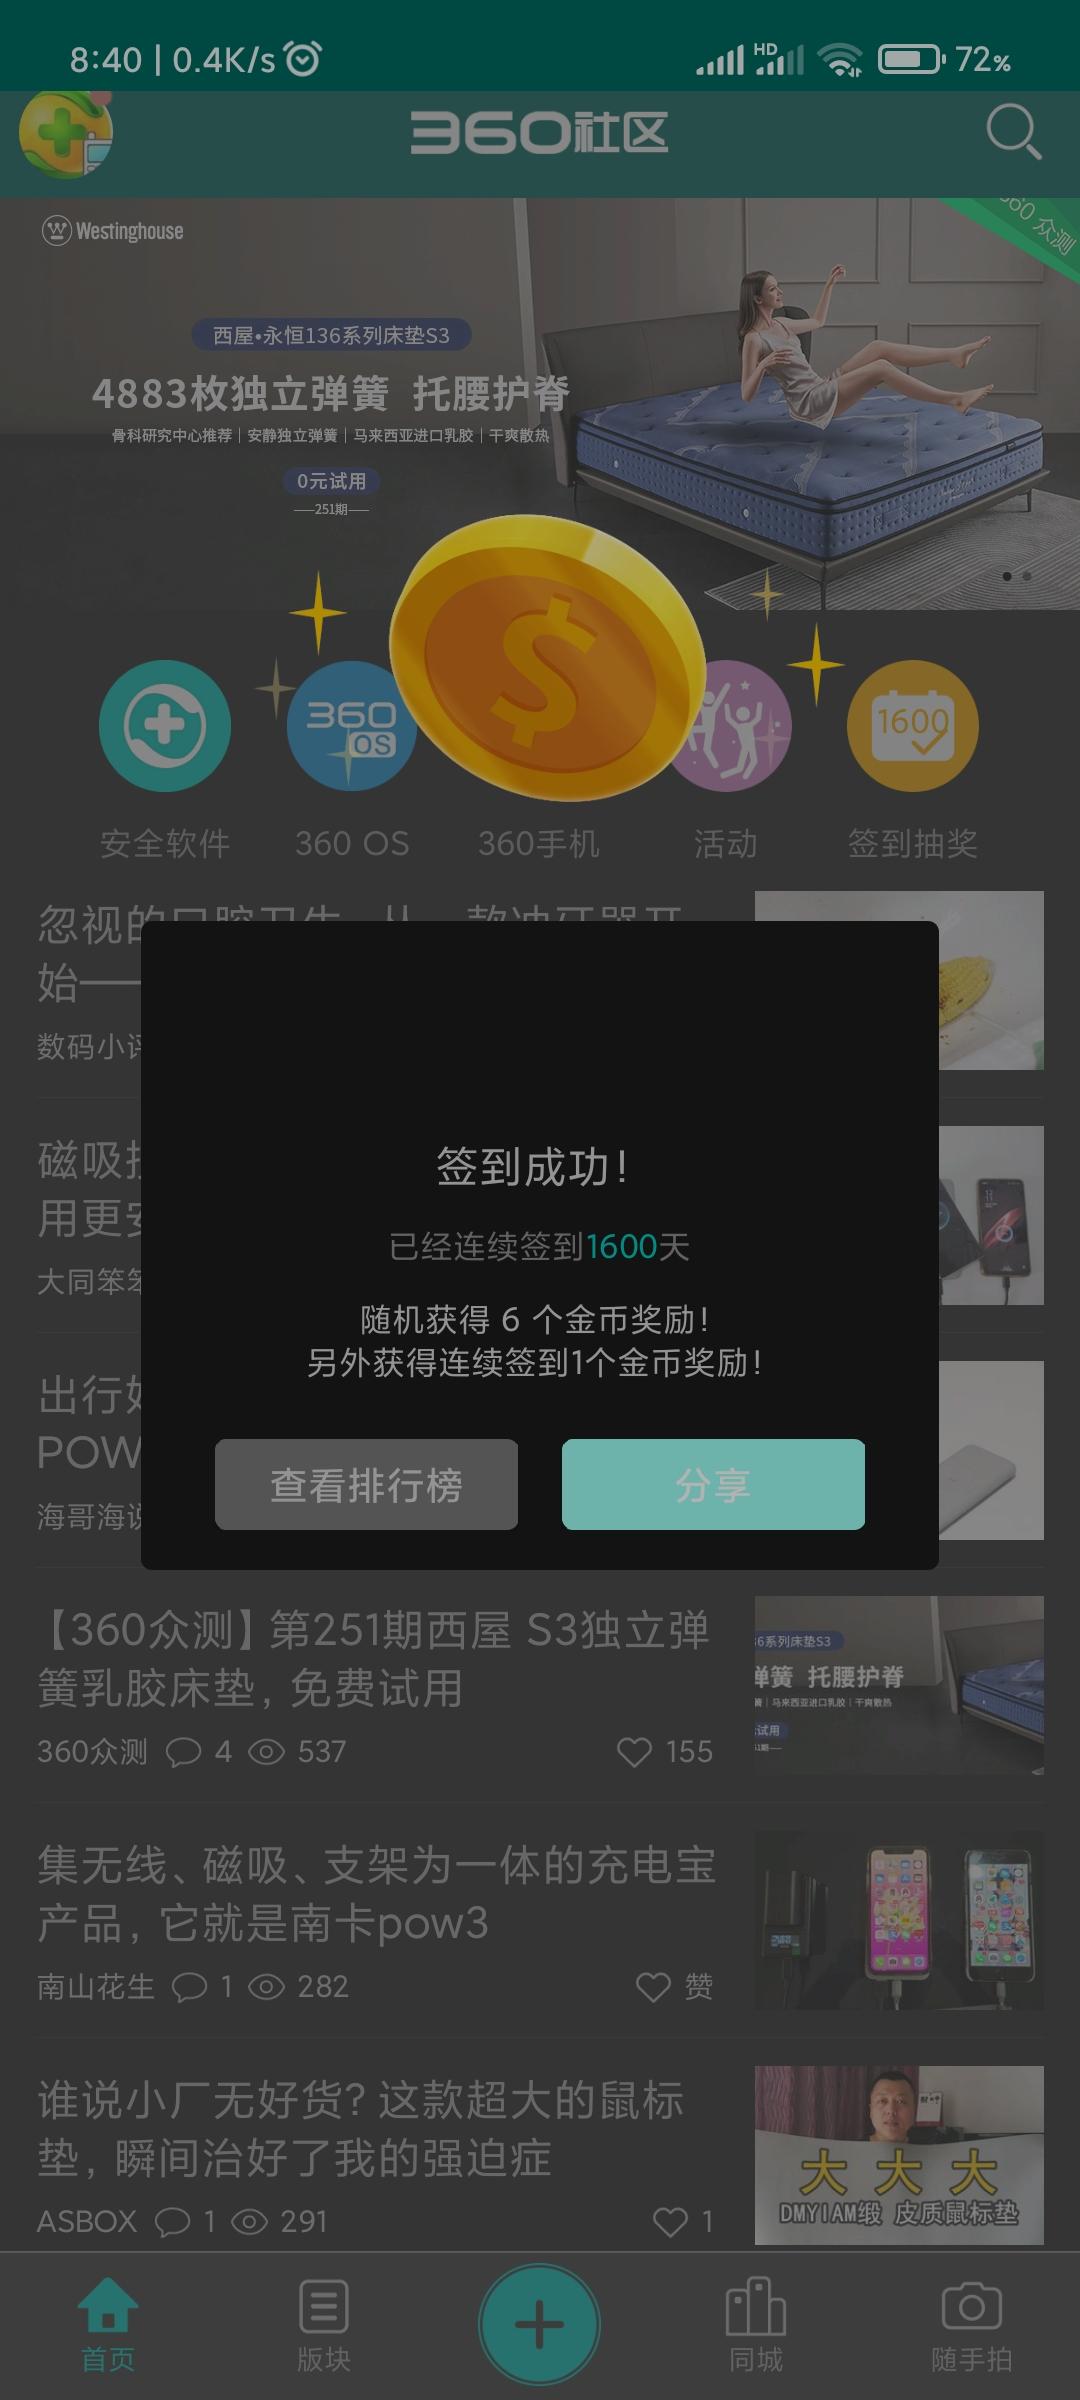 Screenshot_2021-04-18-08-40-24-654_com.qiku.bbs.jpg